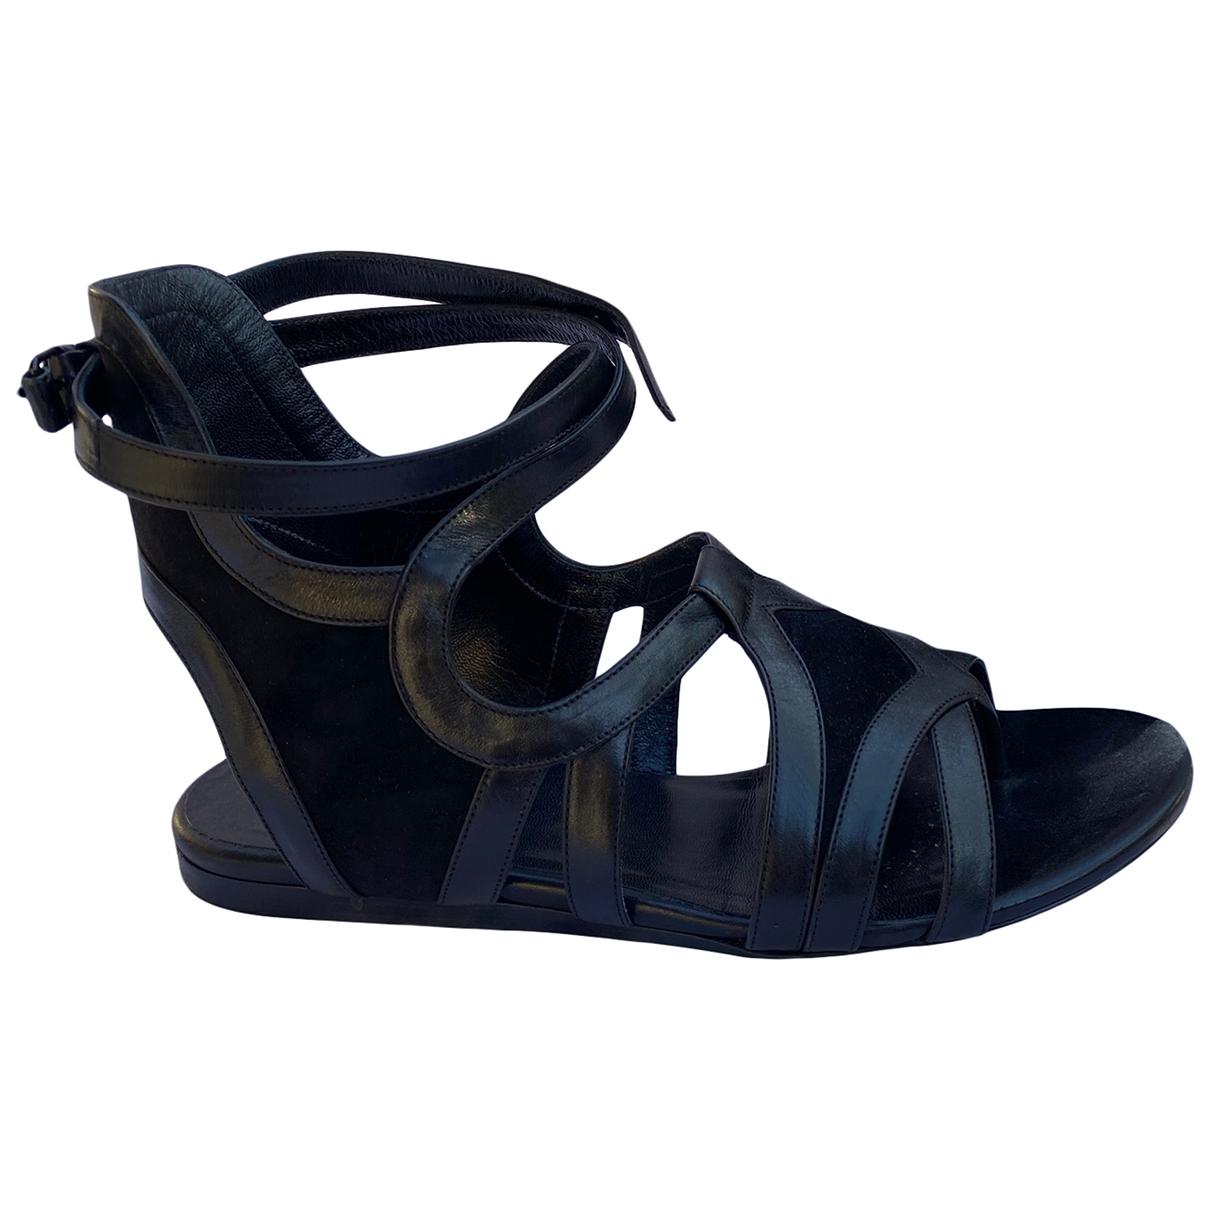 Sandalias romanas de Cuero Balenciaga